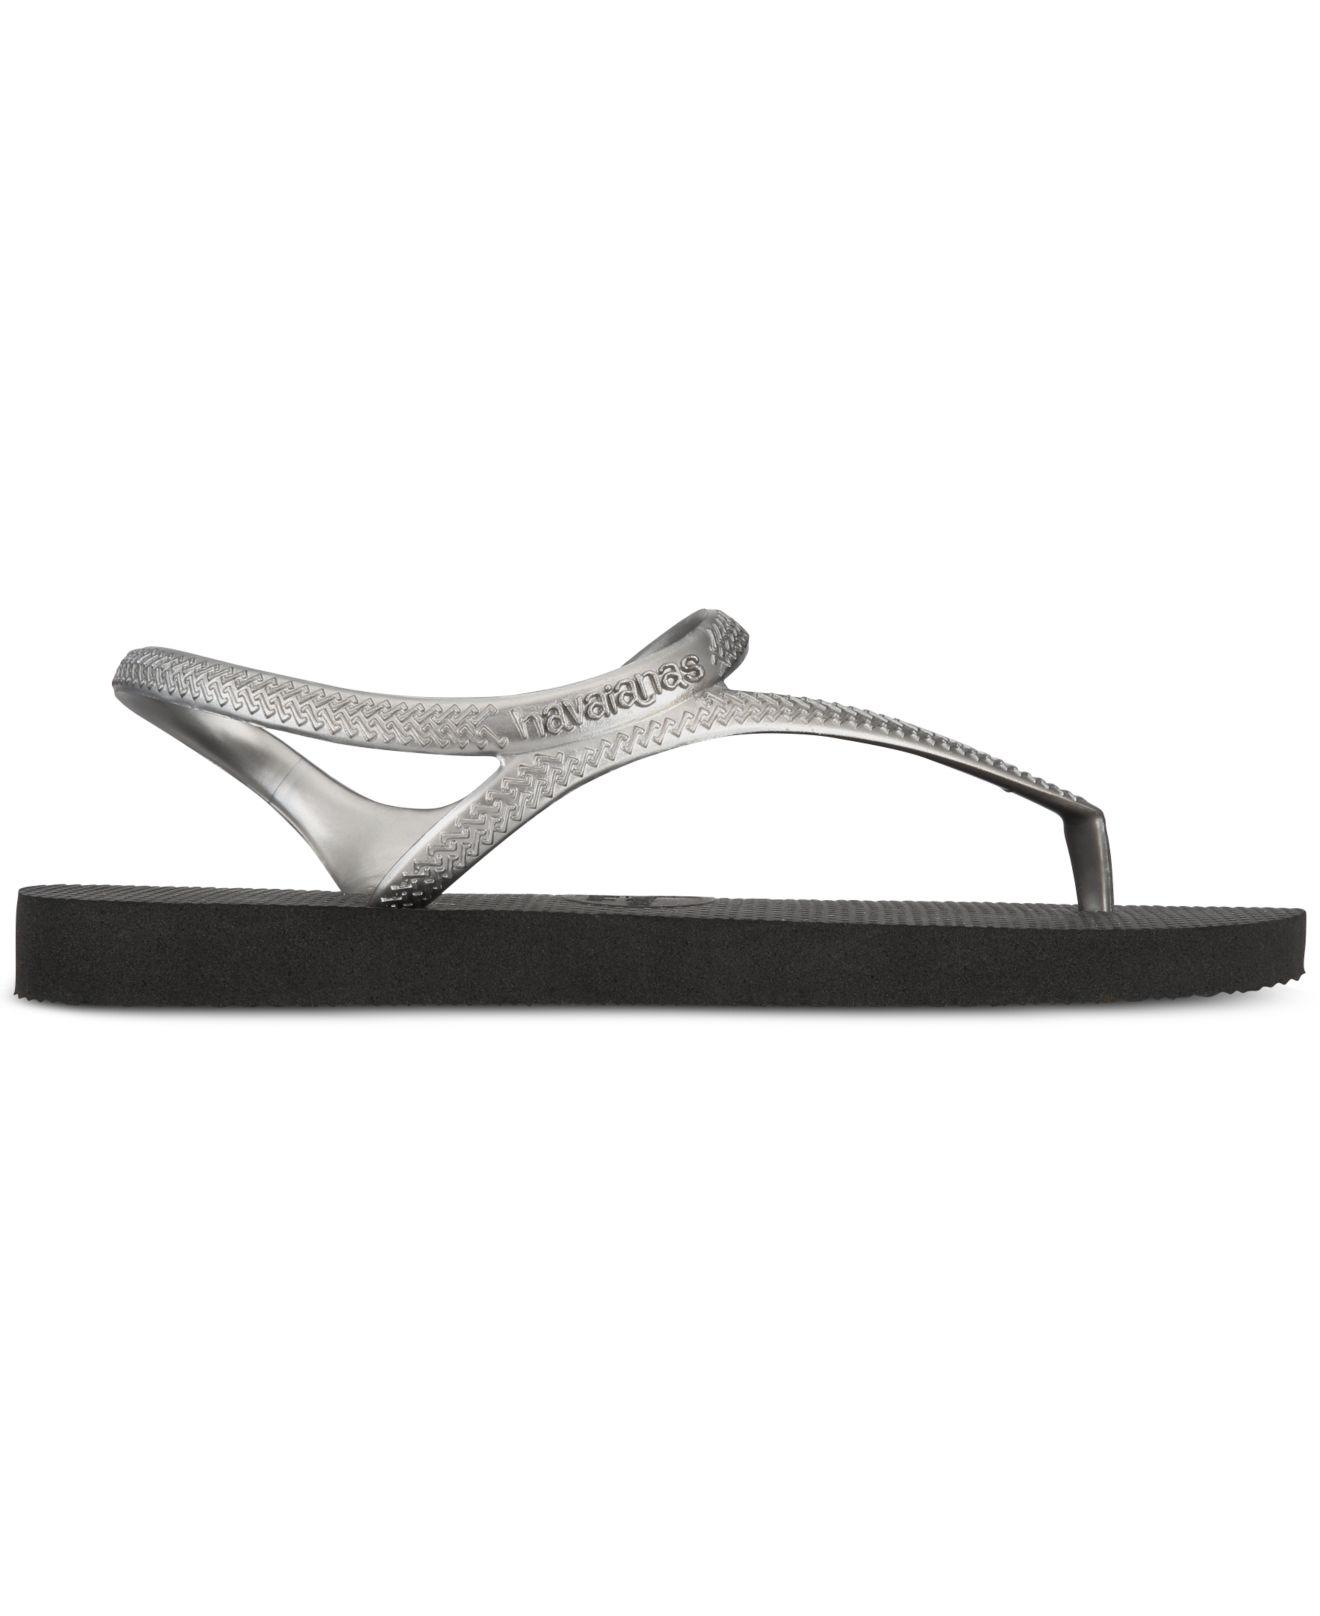 c63a1701e Lyst - Havaianas H.fl Urban Black-silver Flip Flops in Black - Save 14%